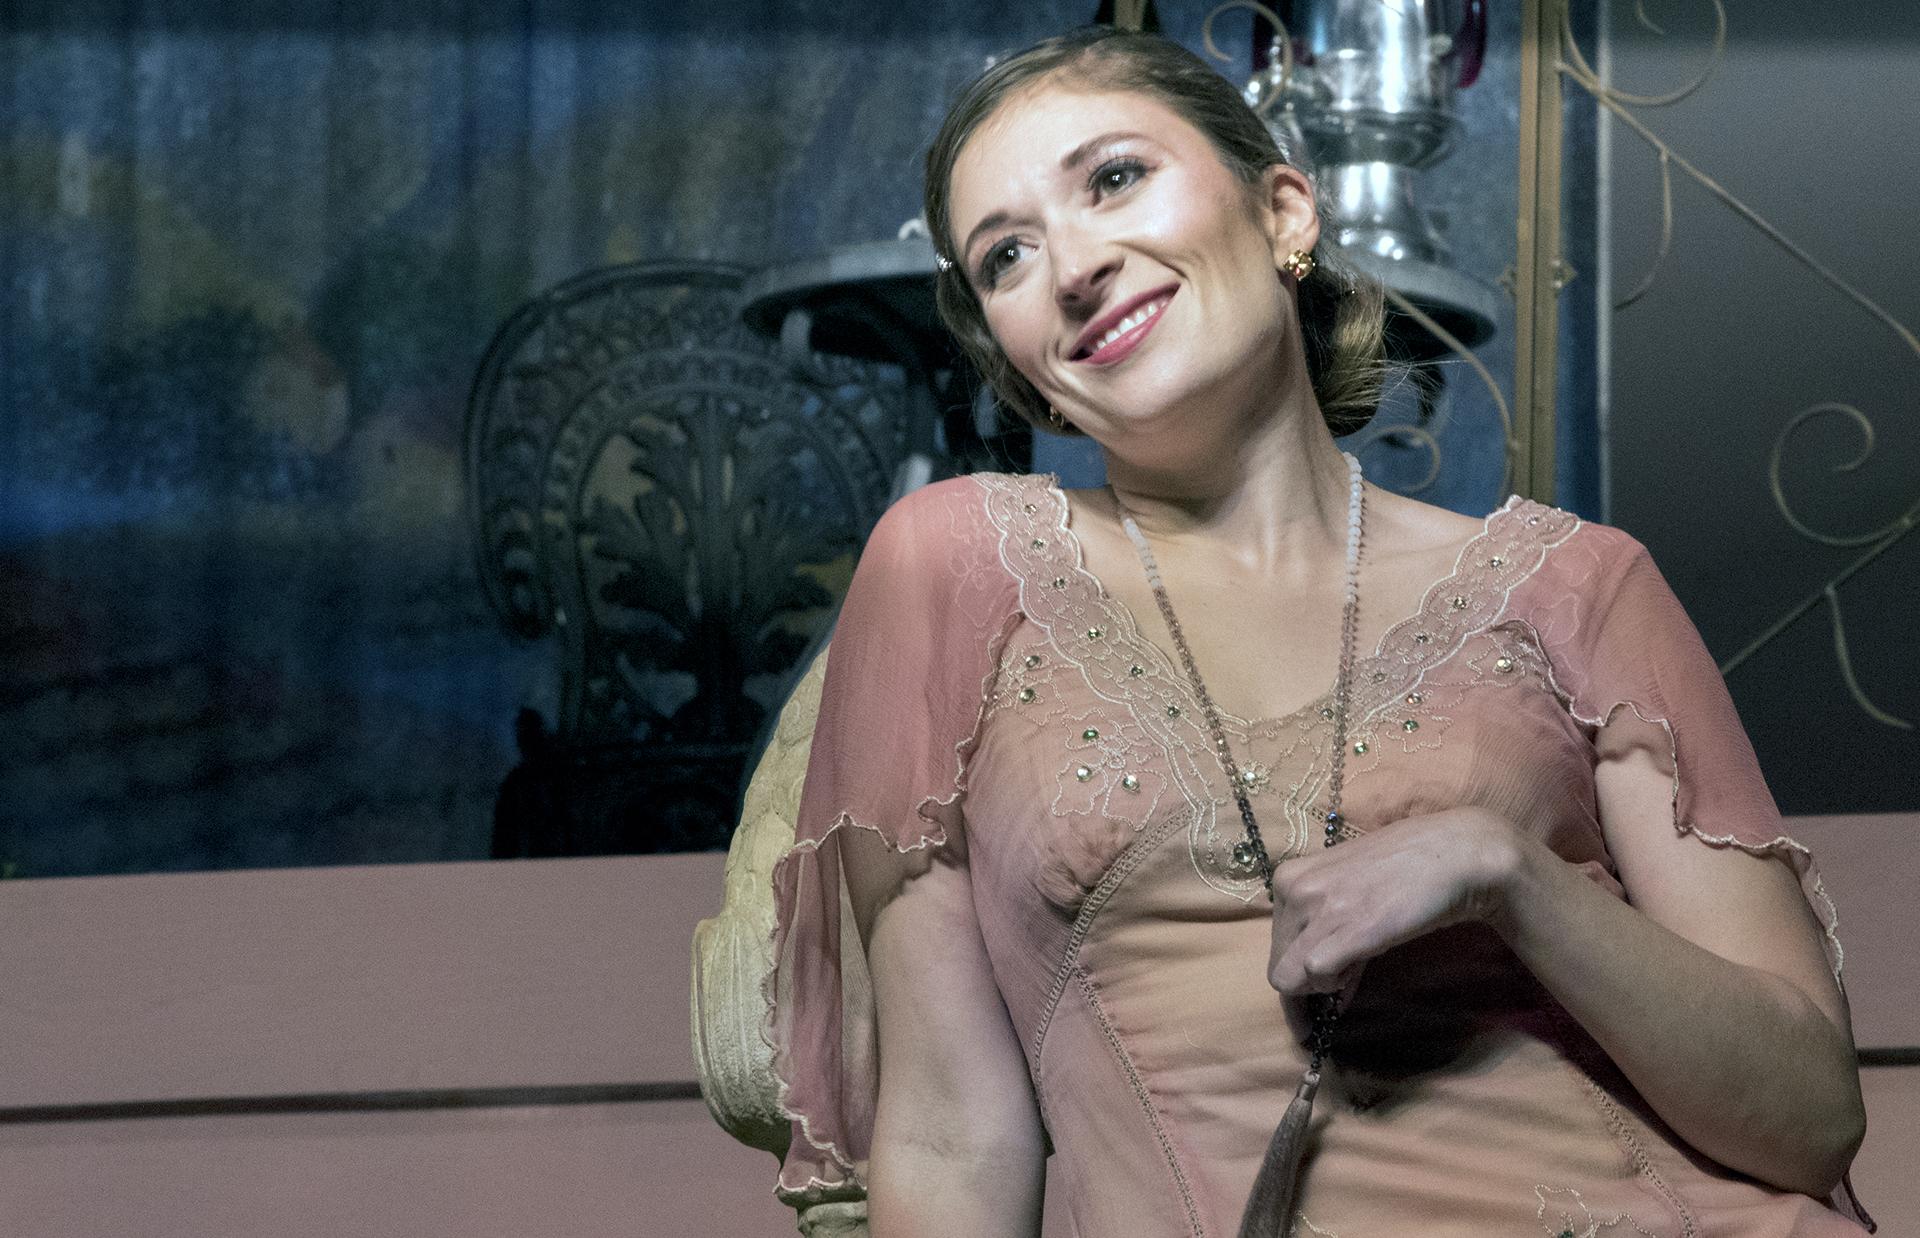 Adina in L'elisir d'amore